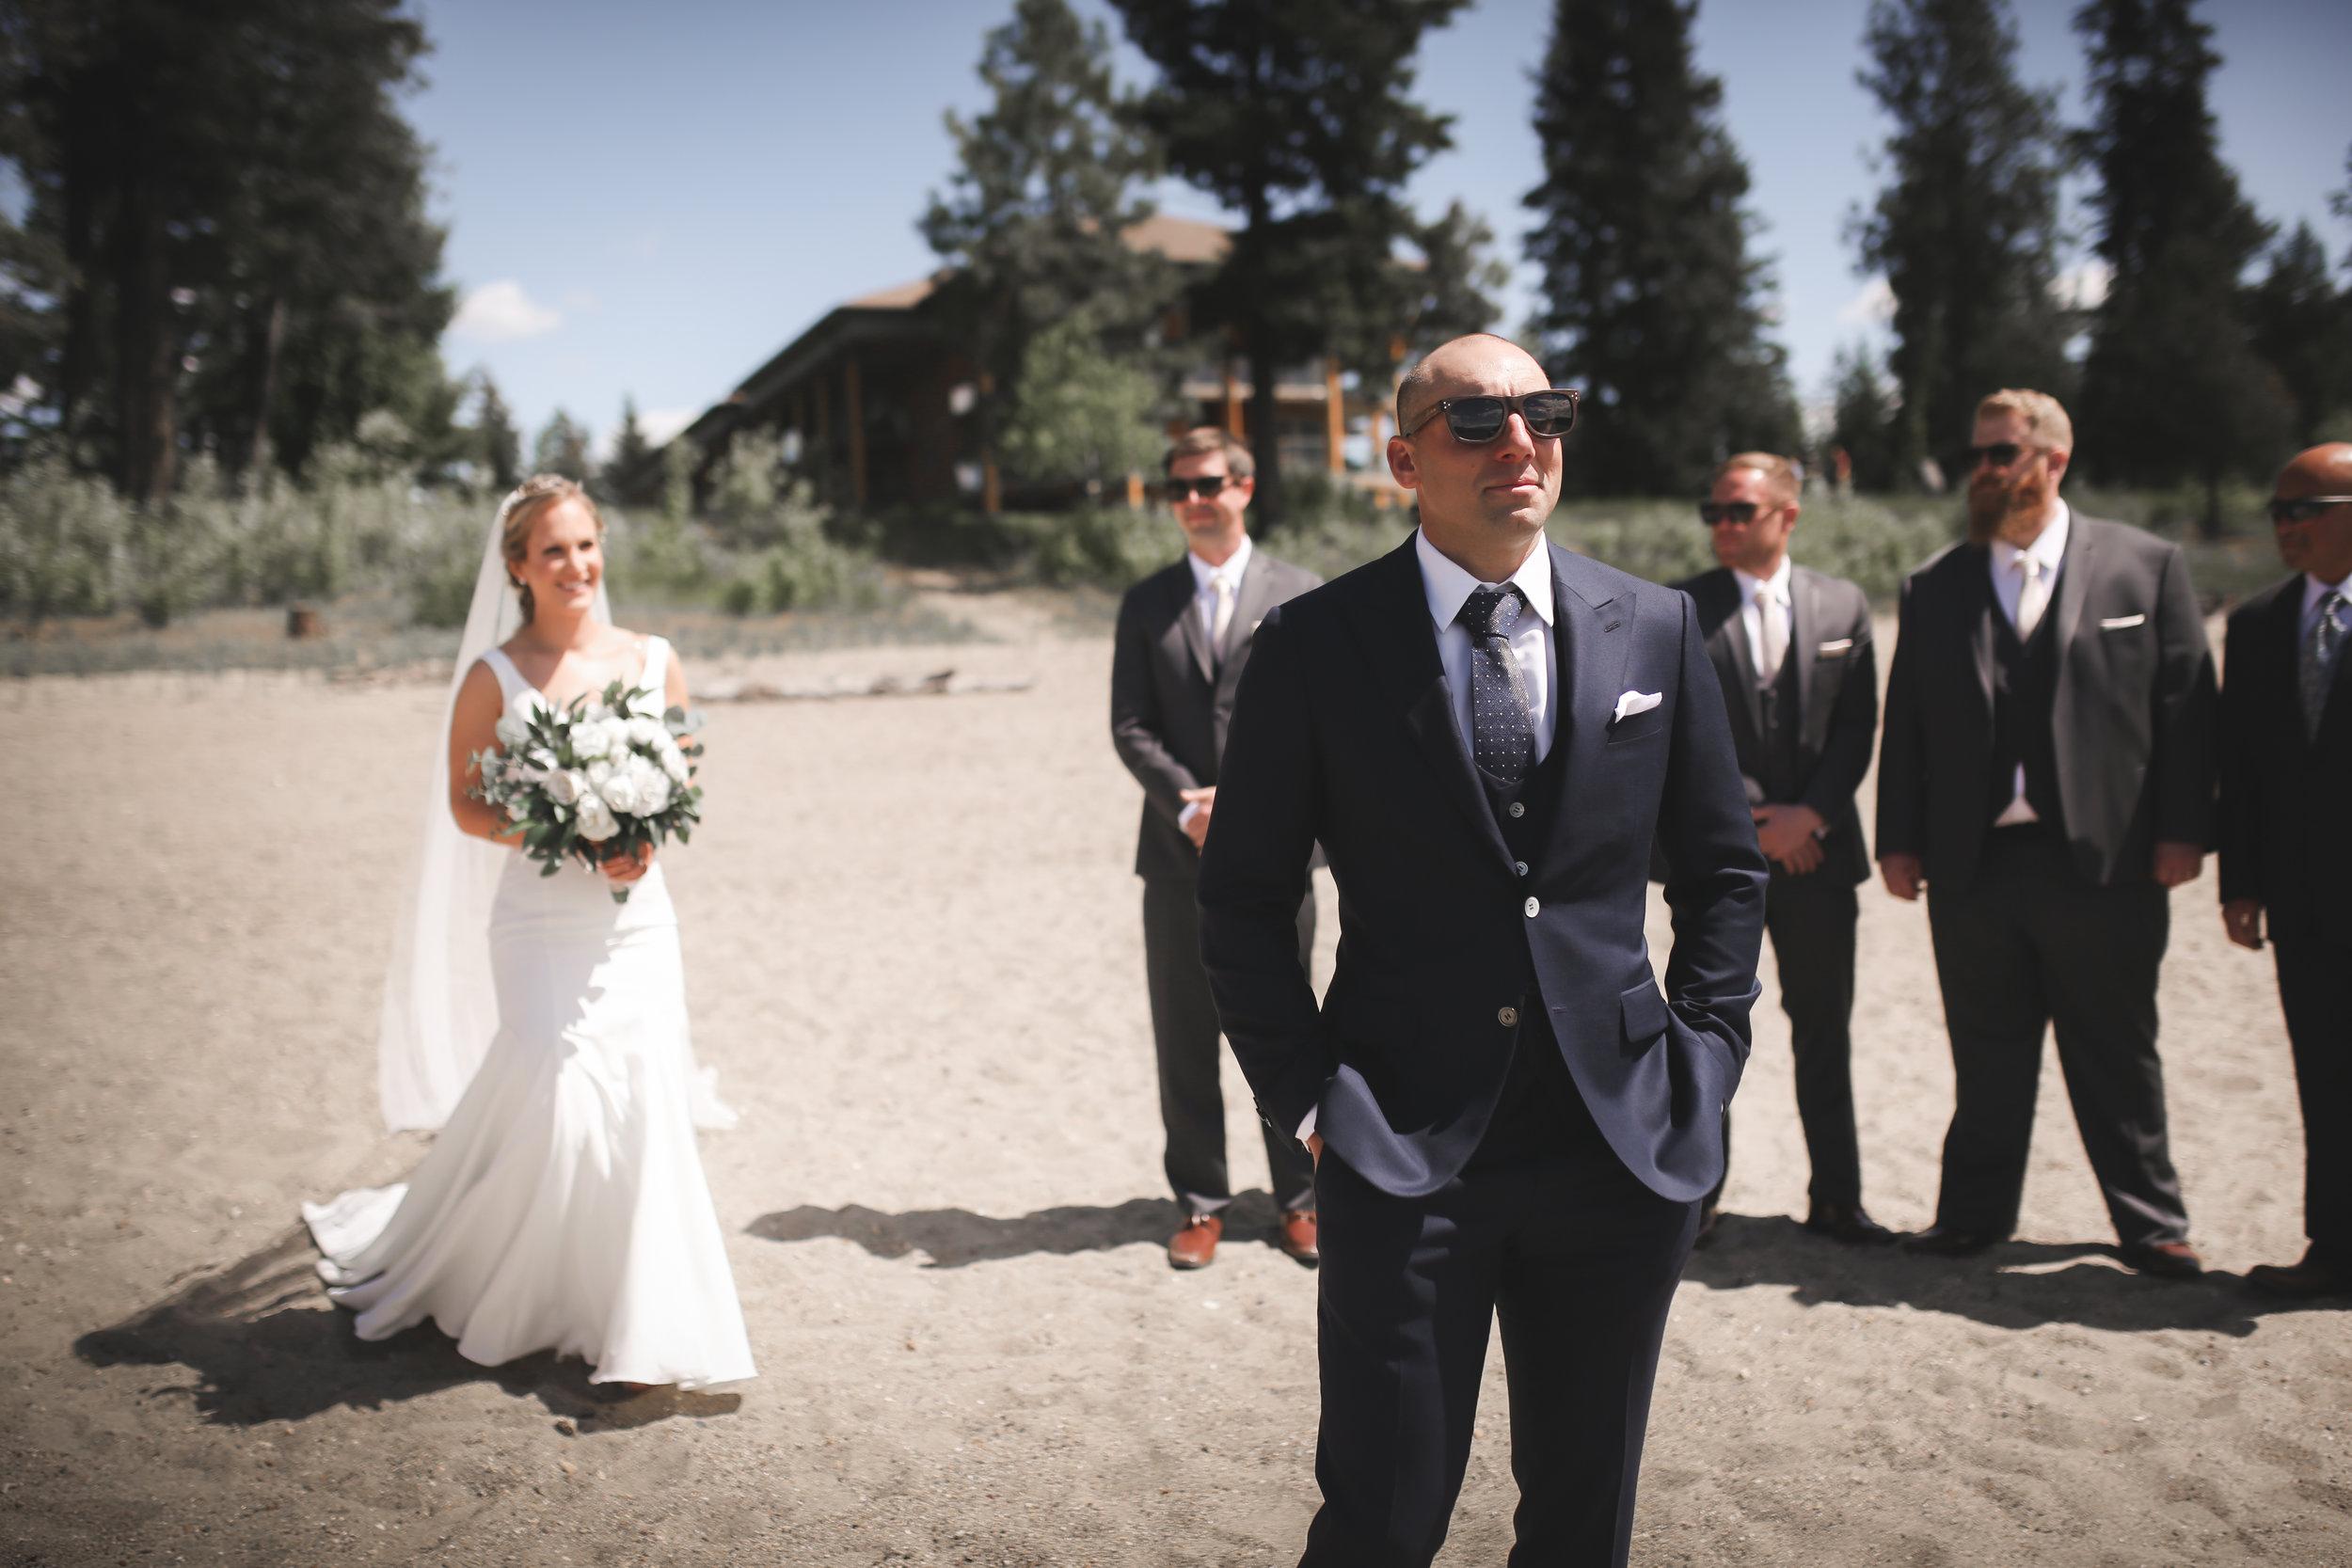 81 Adam Ziorio Photography - Kate & Ben's Wedding.jpg